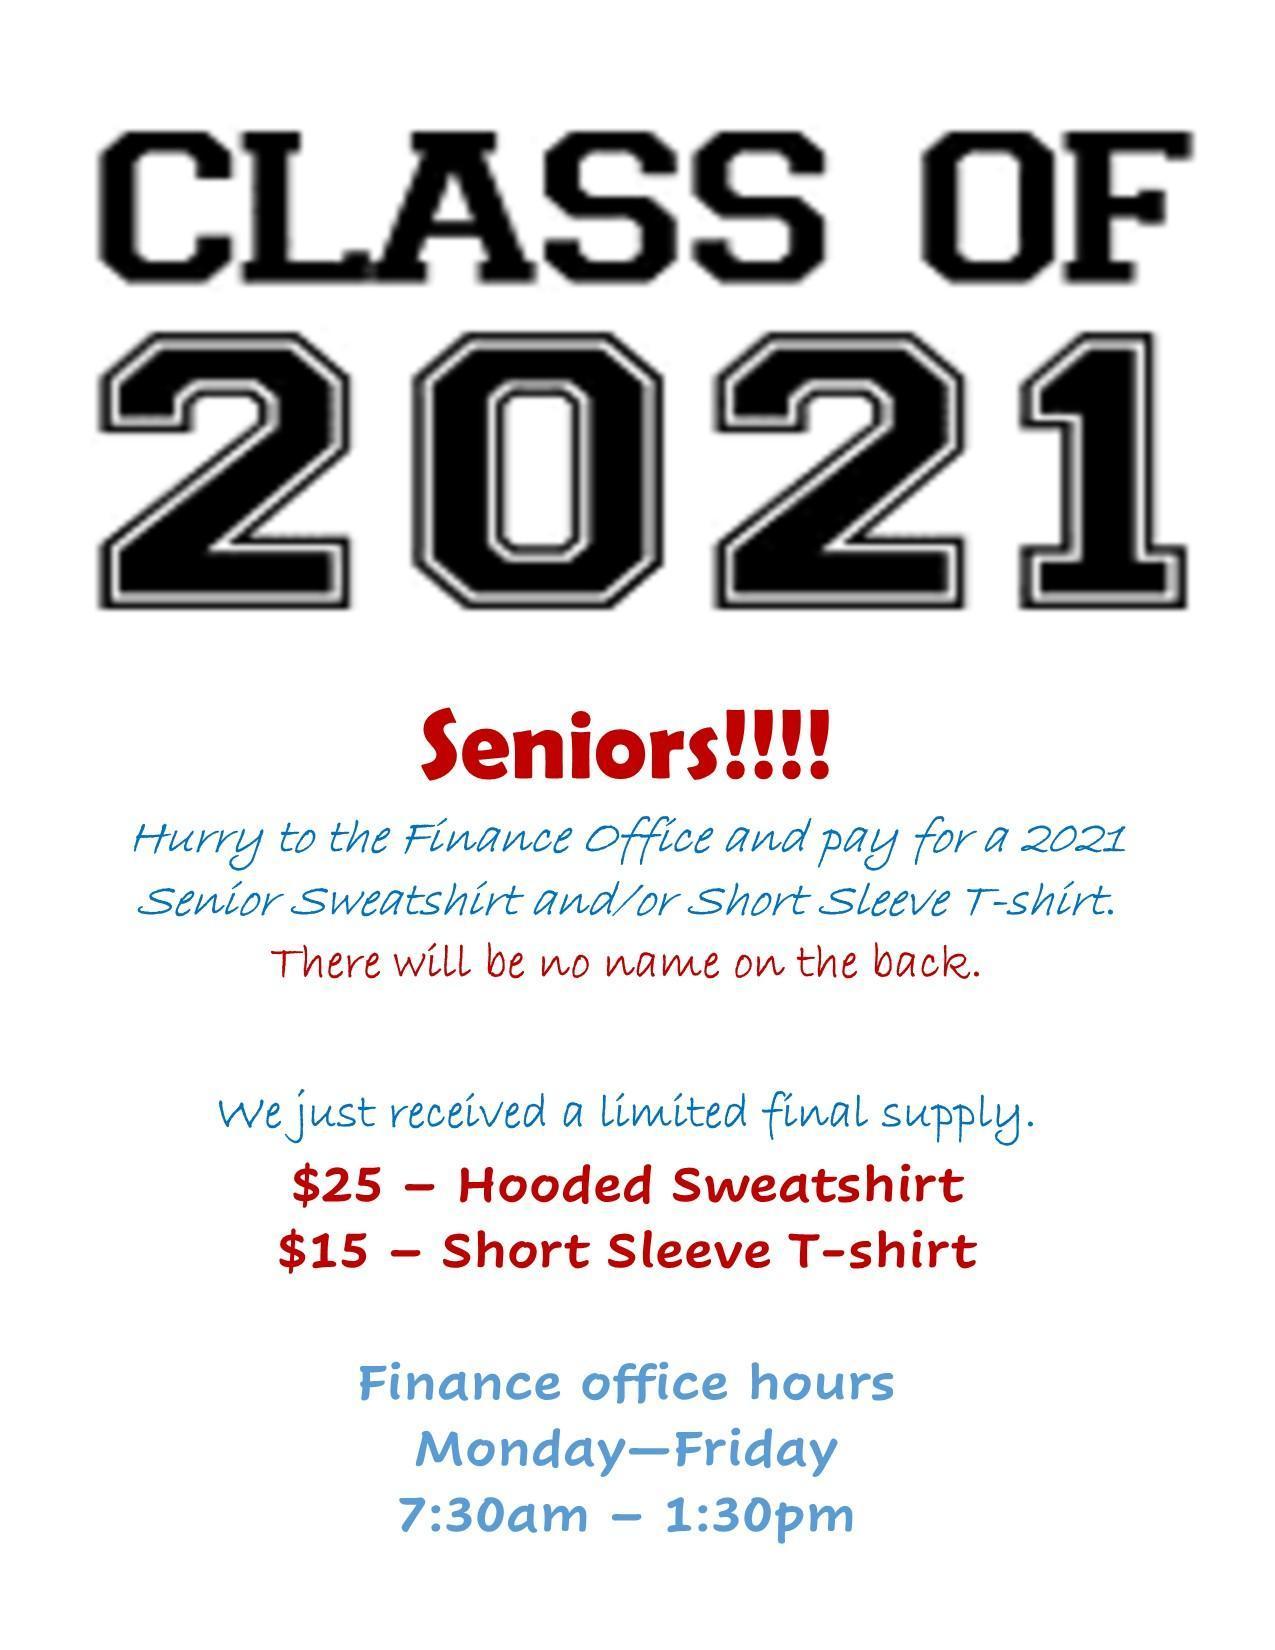 Senior extra shirts 2021